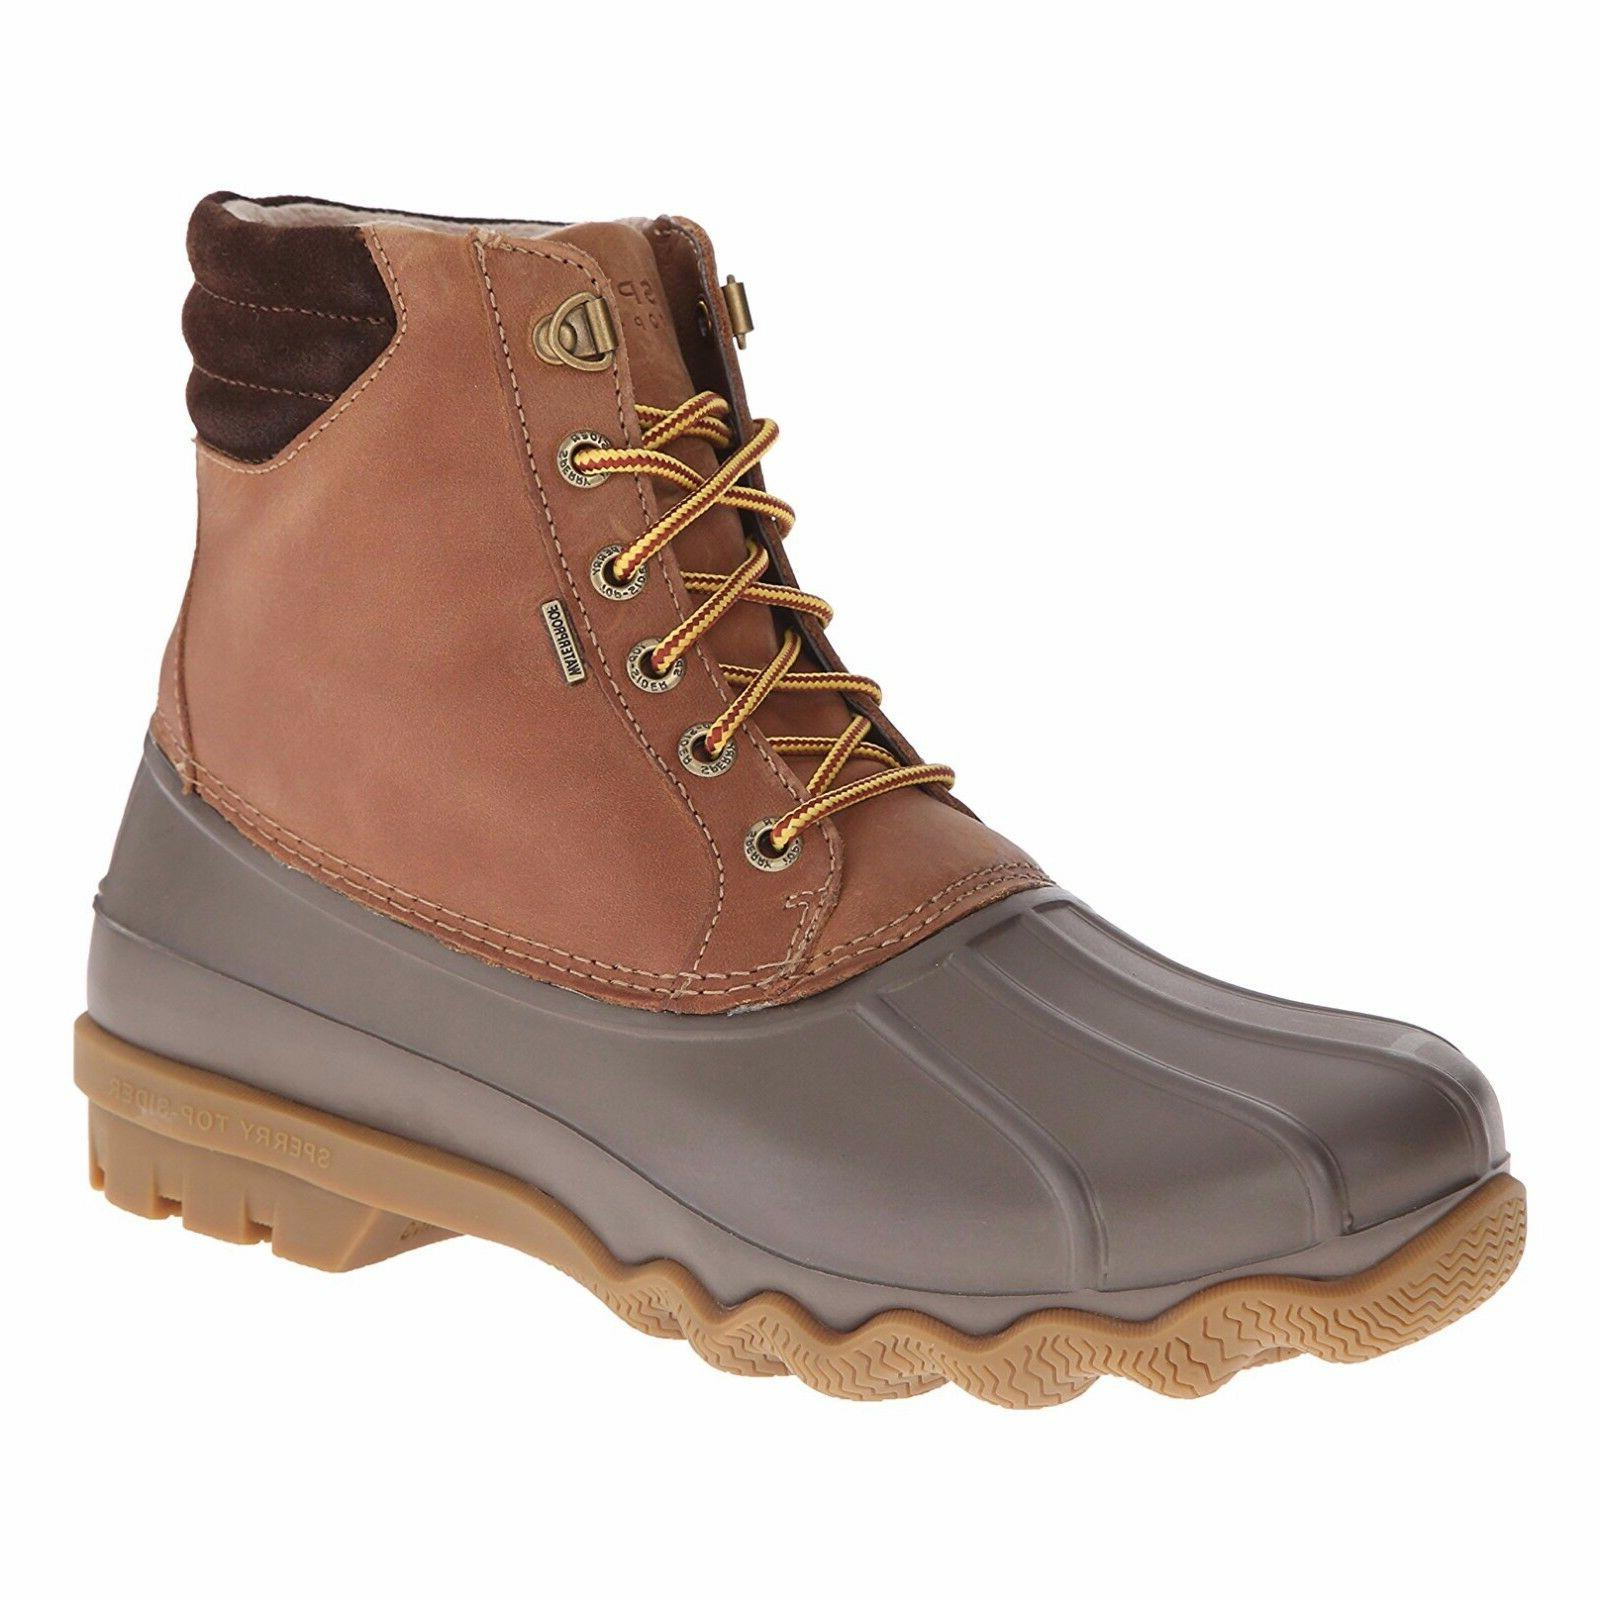 Sperry Top-Sider Men's Avenue Duck Boot Chukka Winter Boot T